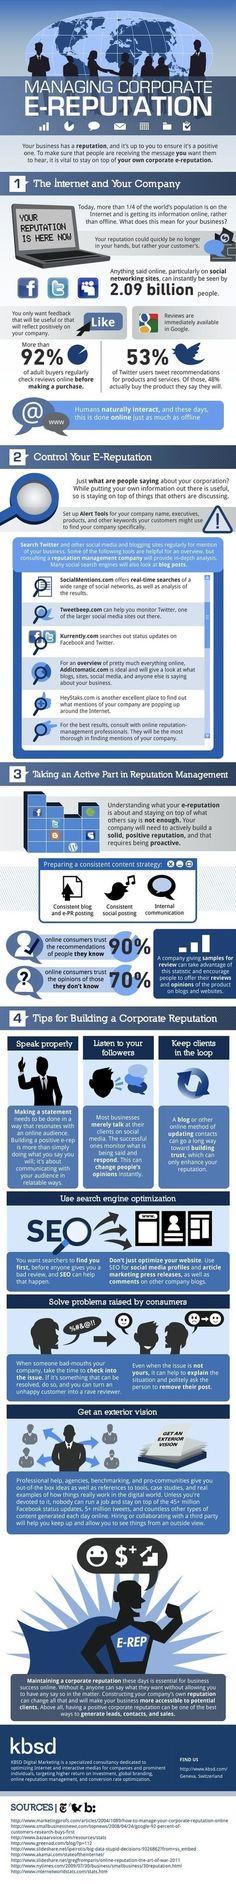 Managing-Corporate-E-Reputation